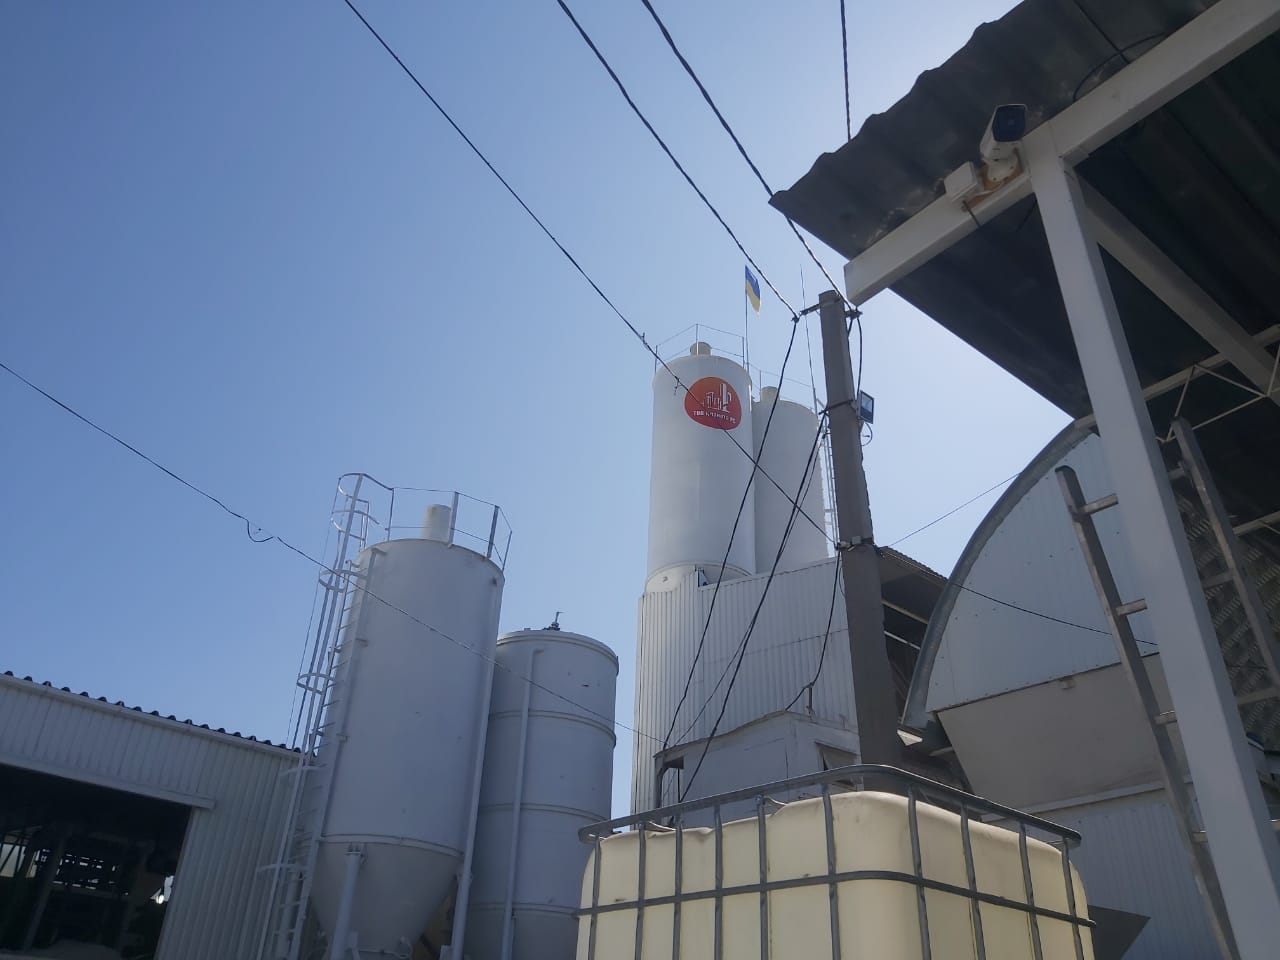 Купити бетон Херсон Бетон М200, Бетон М300, Бетон М400